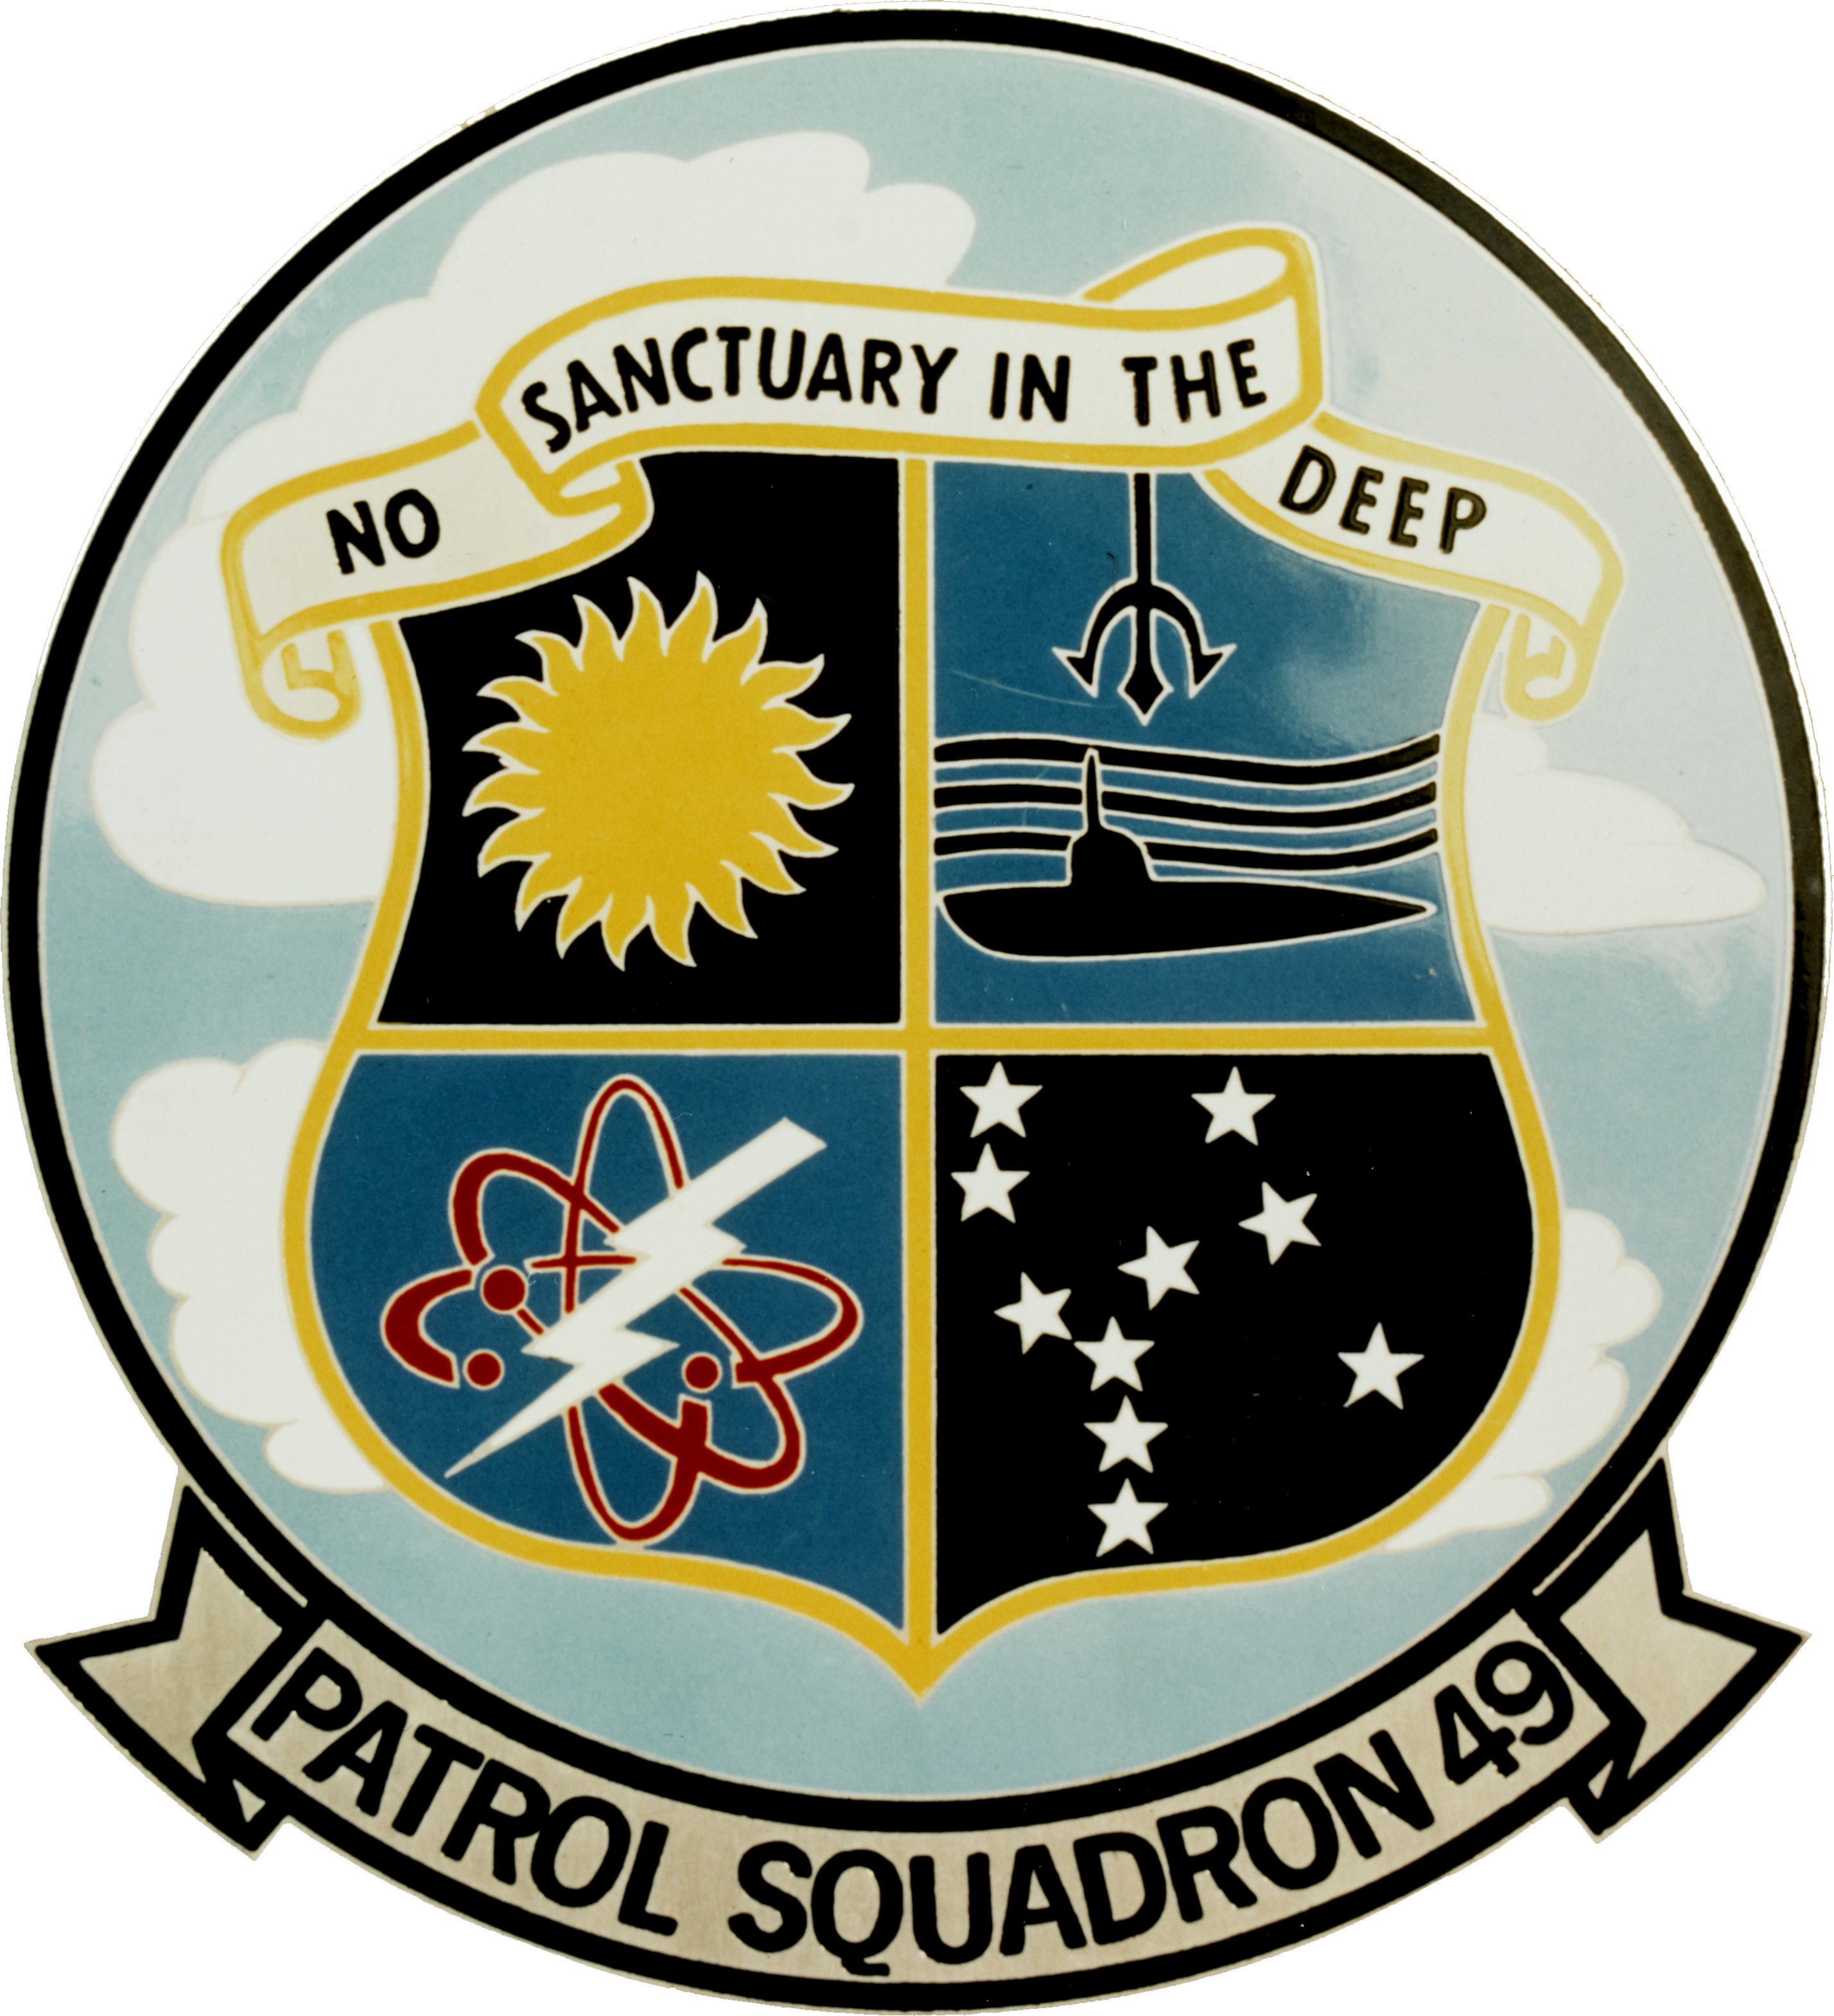 Filepatrol squadron 49 us navy insignia 1962g wikimedia filepatrol squadron 49 us navy insignia 1962g biocorpaavc